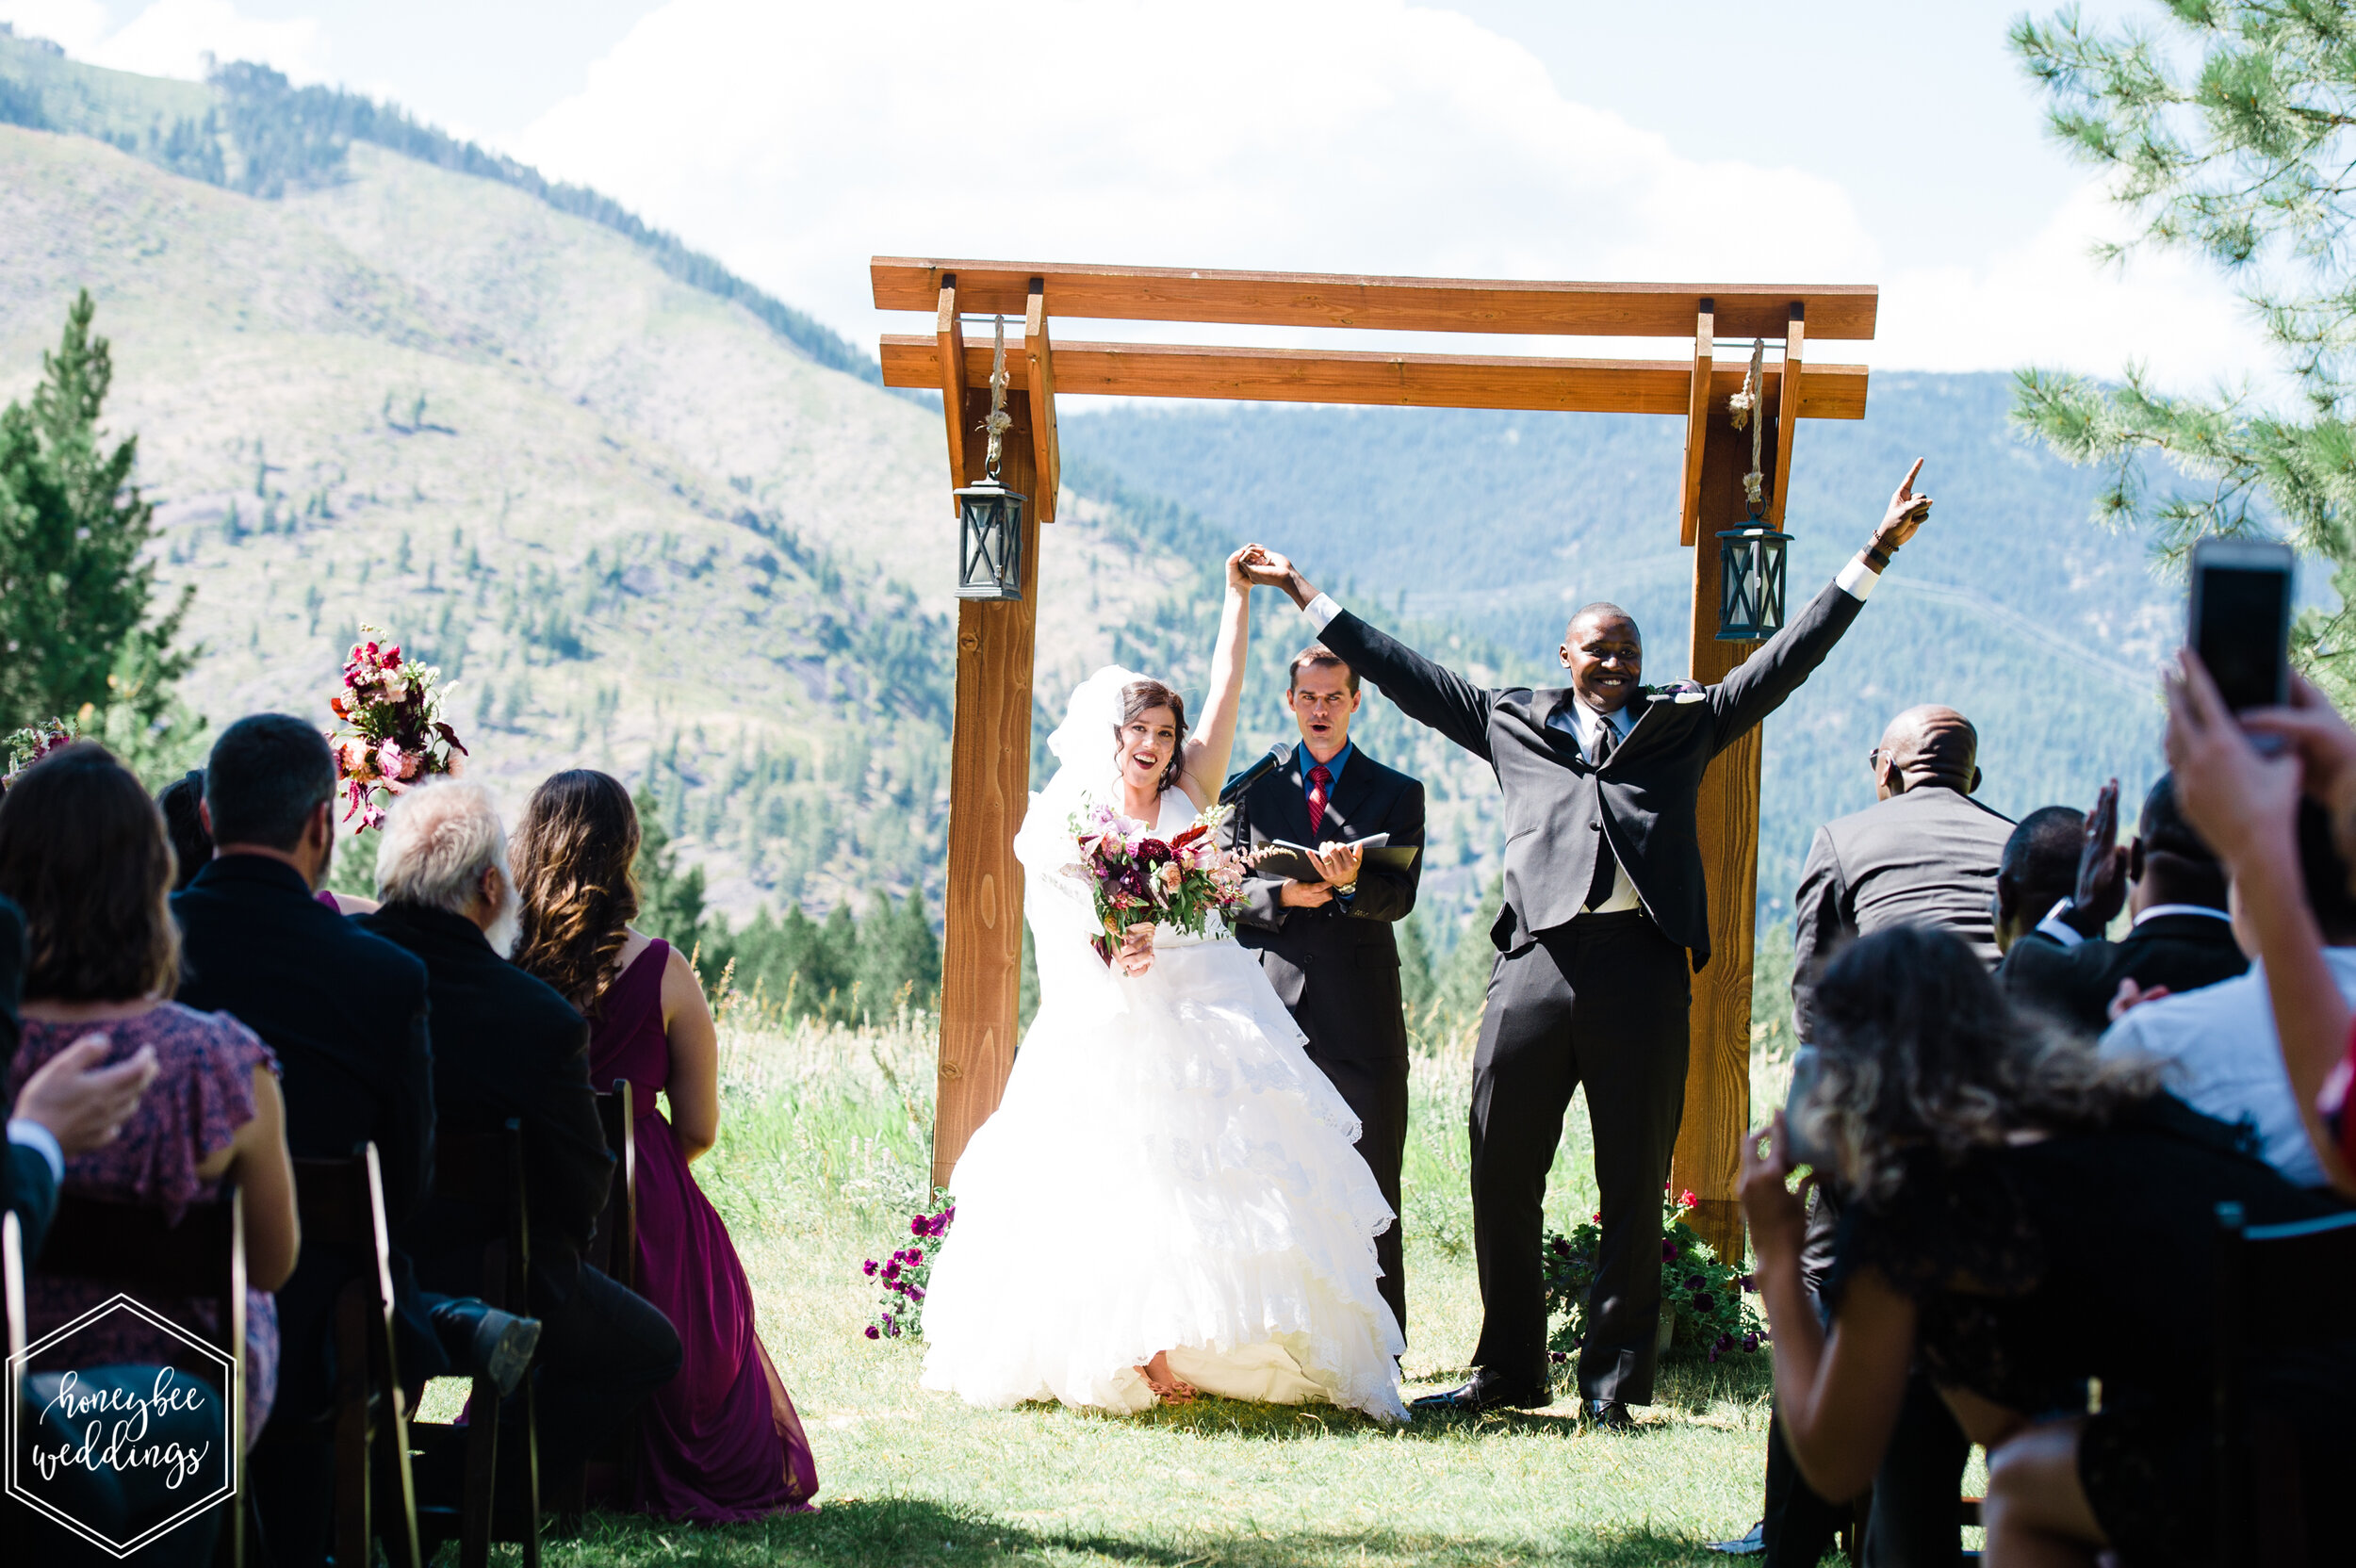 060White Raven Wedding_Montana Wedding Photographer_Rebekah & Likom_Honeybee Weddings_July 27, 2019-1420.jpg